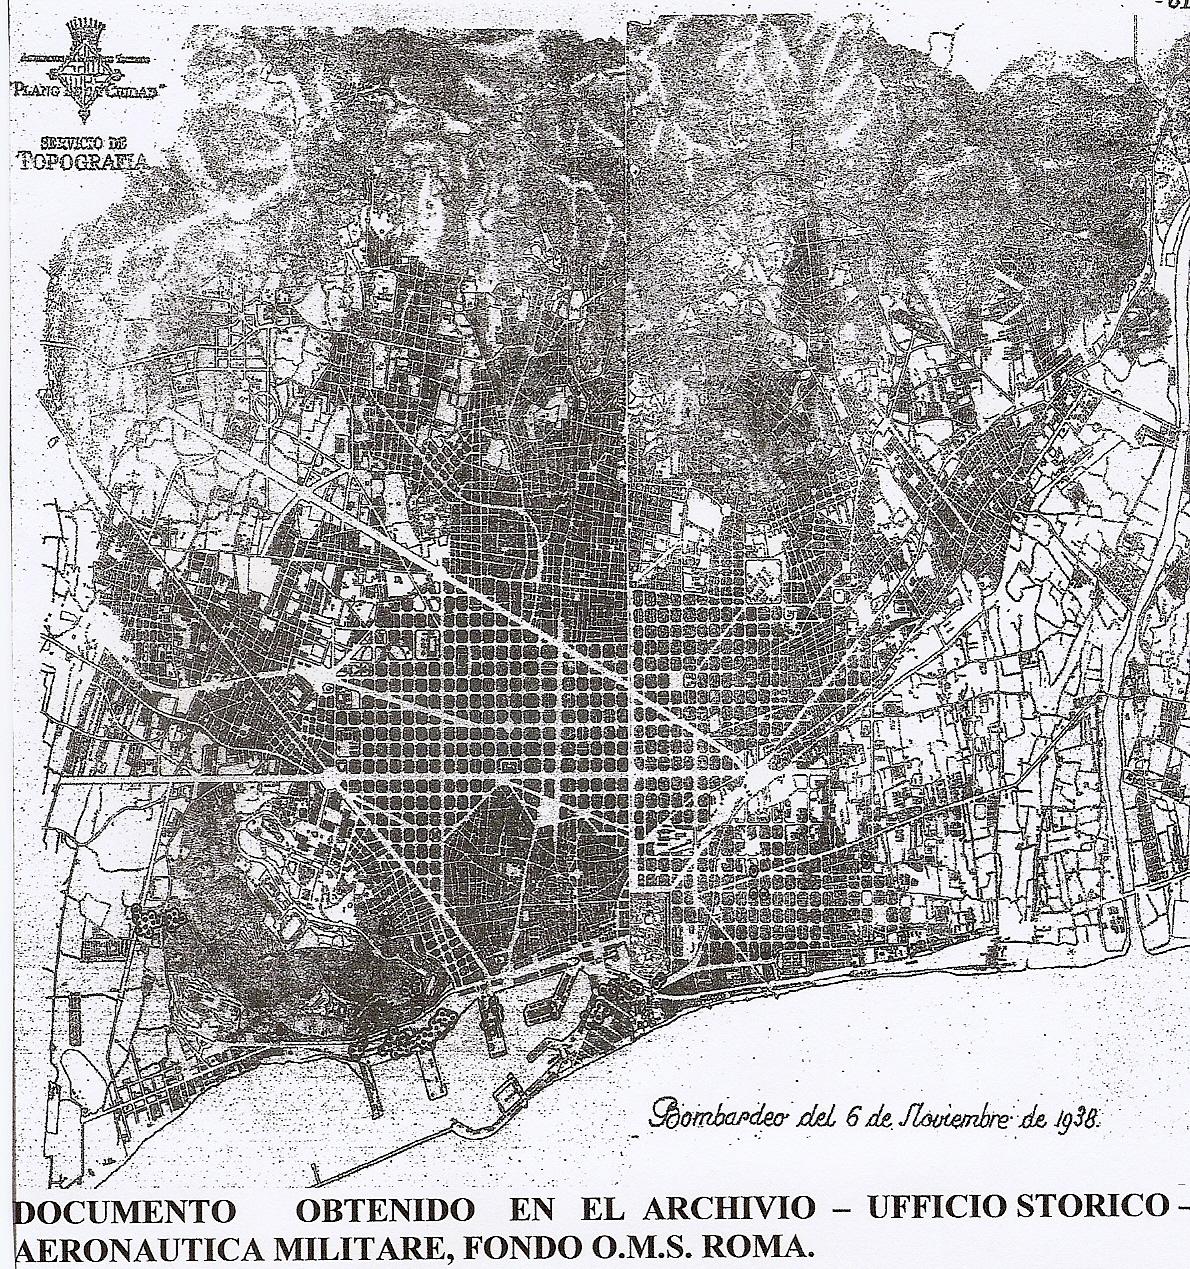 mapa barcelona bombas marcadas lacruelguerra.com